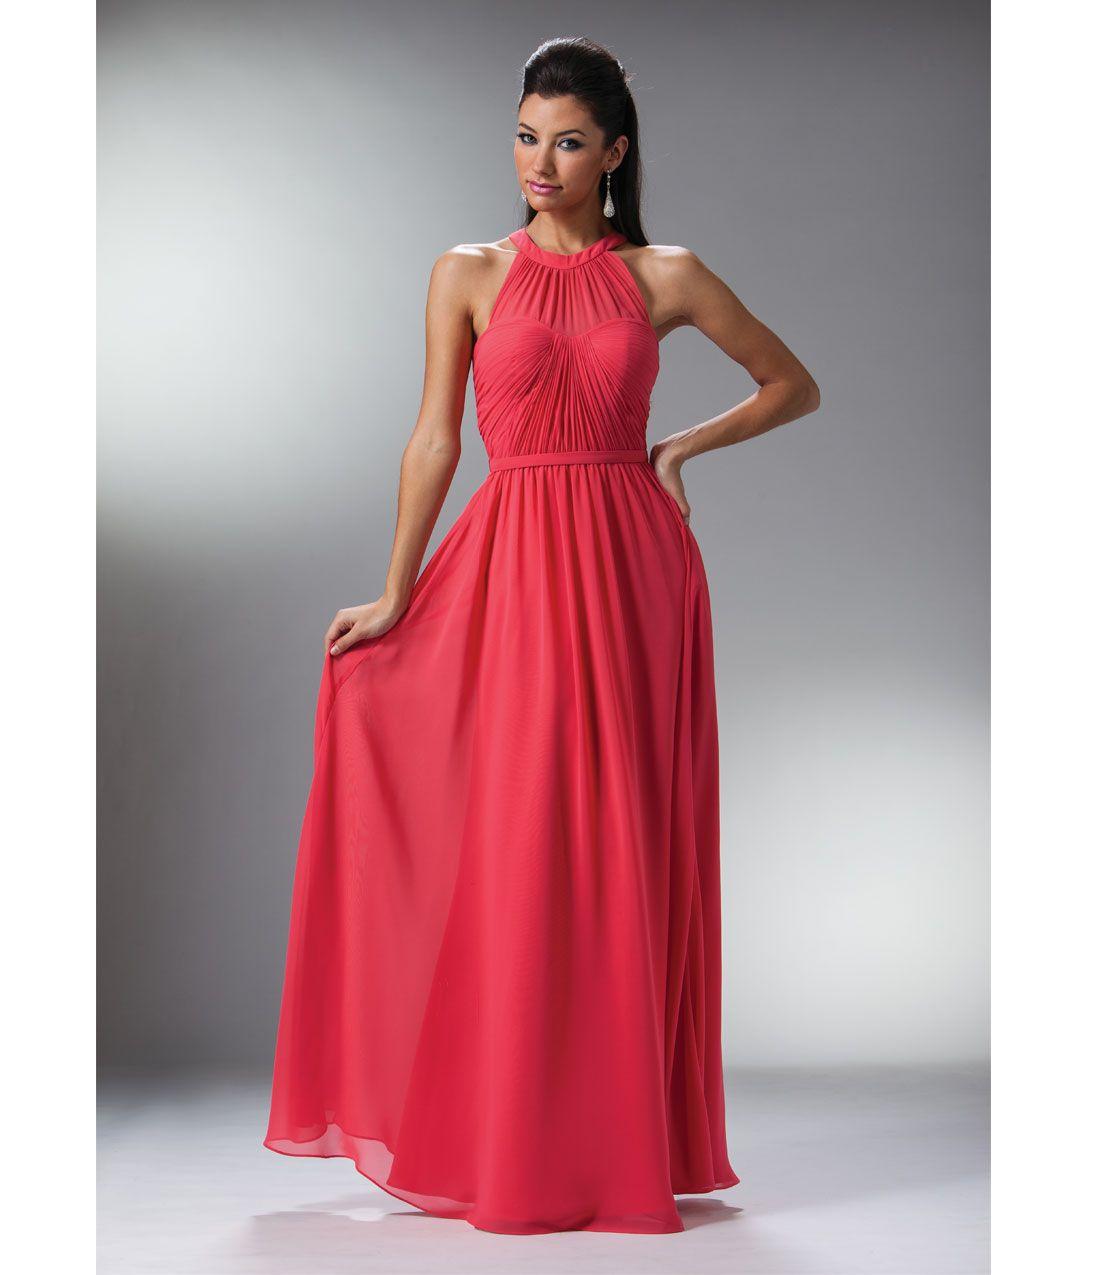 Sweetheart Neckline Prom Dresses Retro